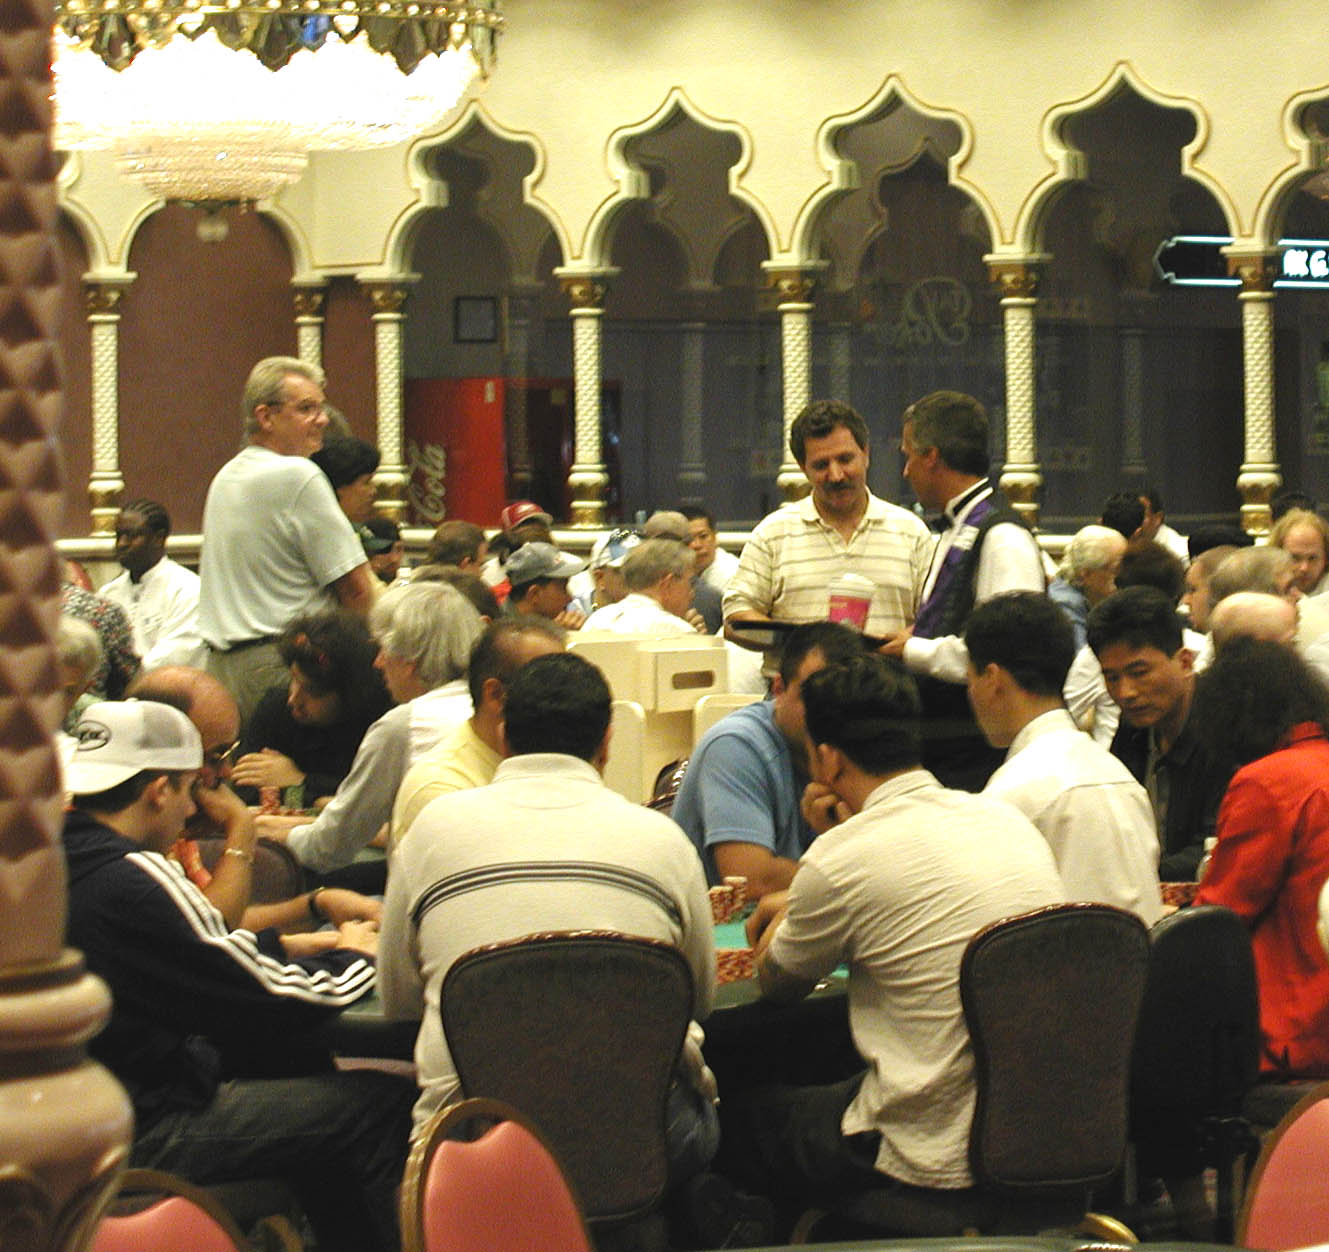 Tal-Mahal-Poker-Room-1